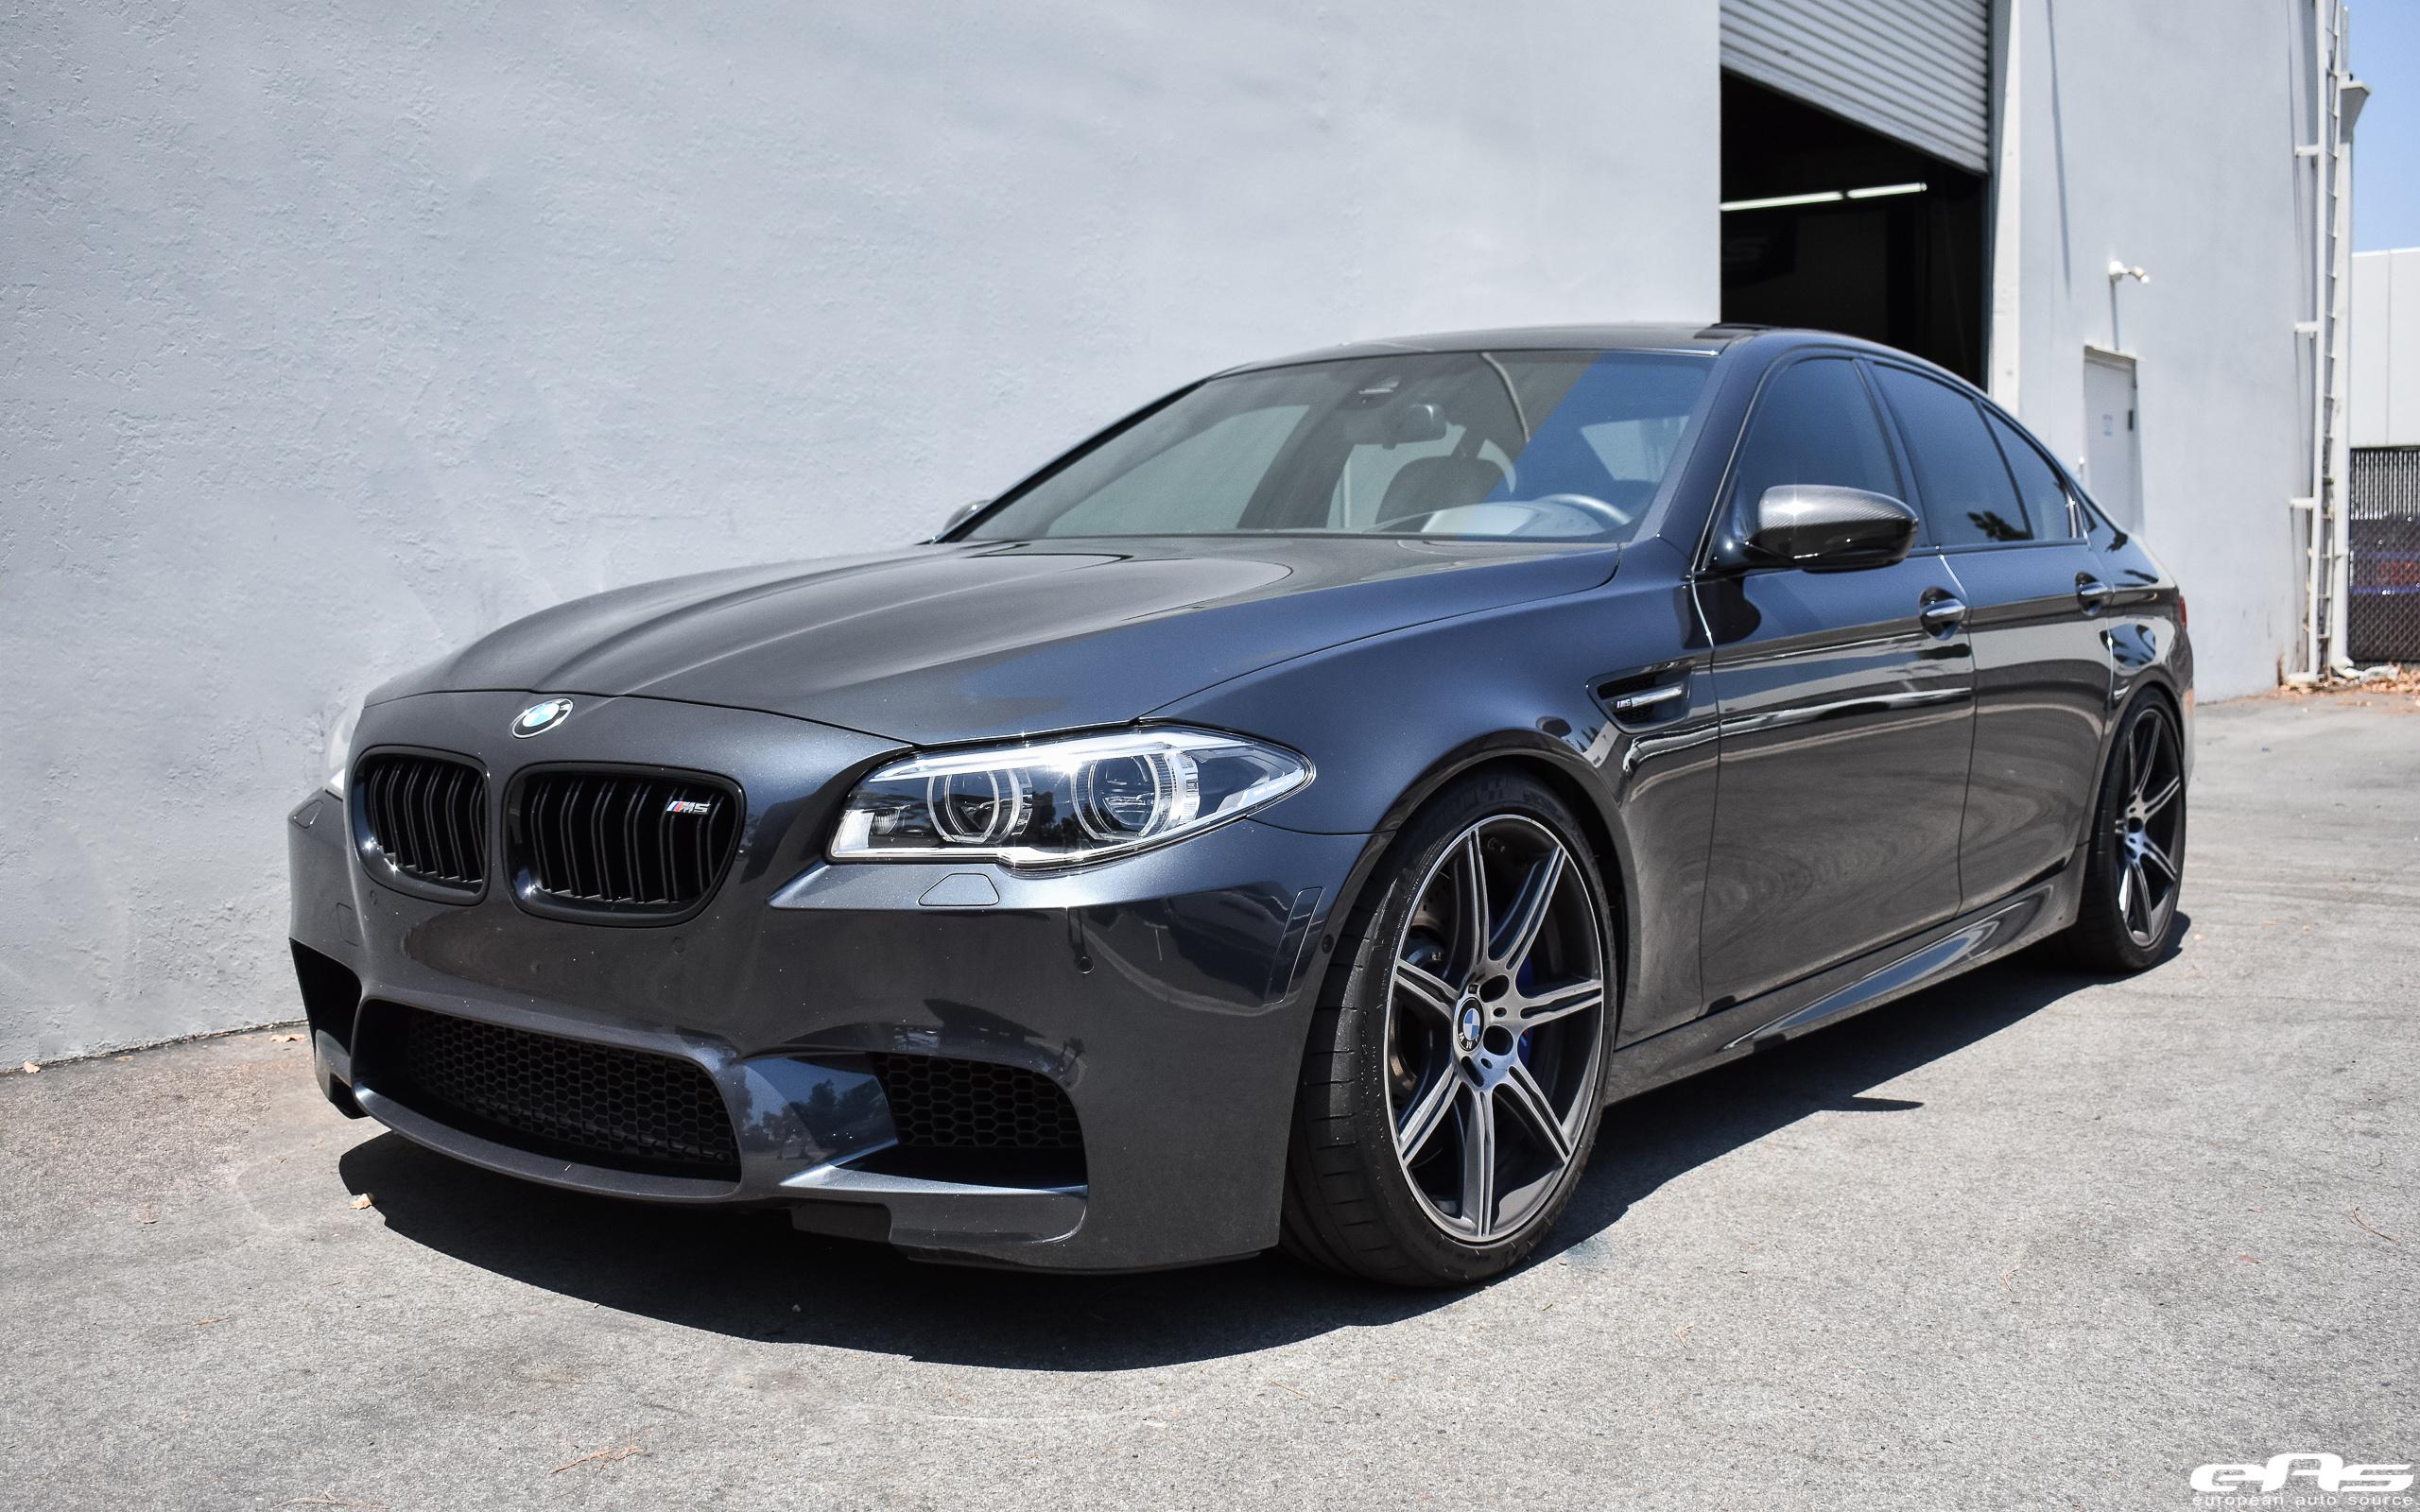 Singapore Gray BMW M5 Gets An Eisenmann Exhaust System Installed 10